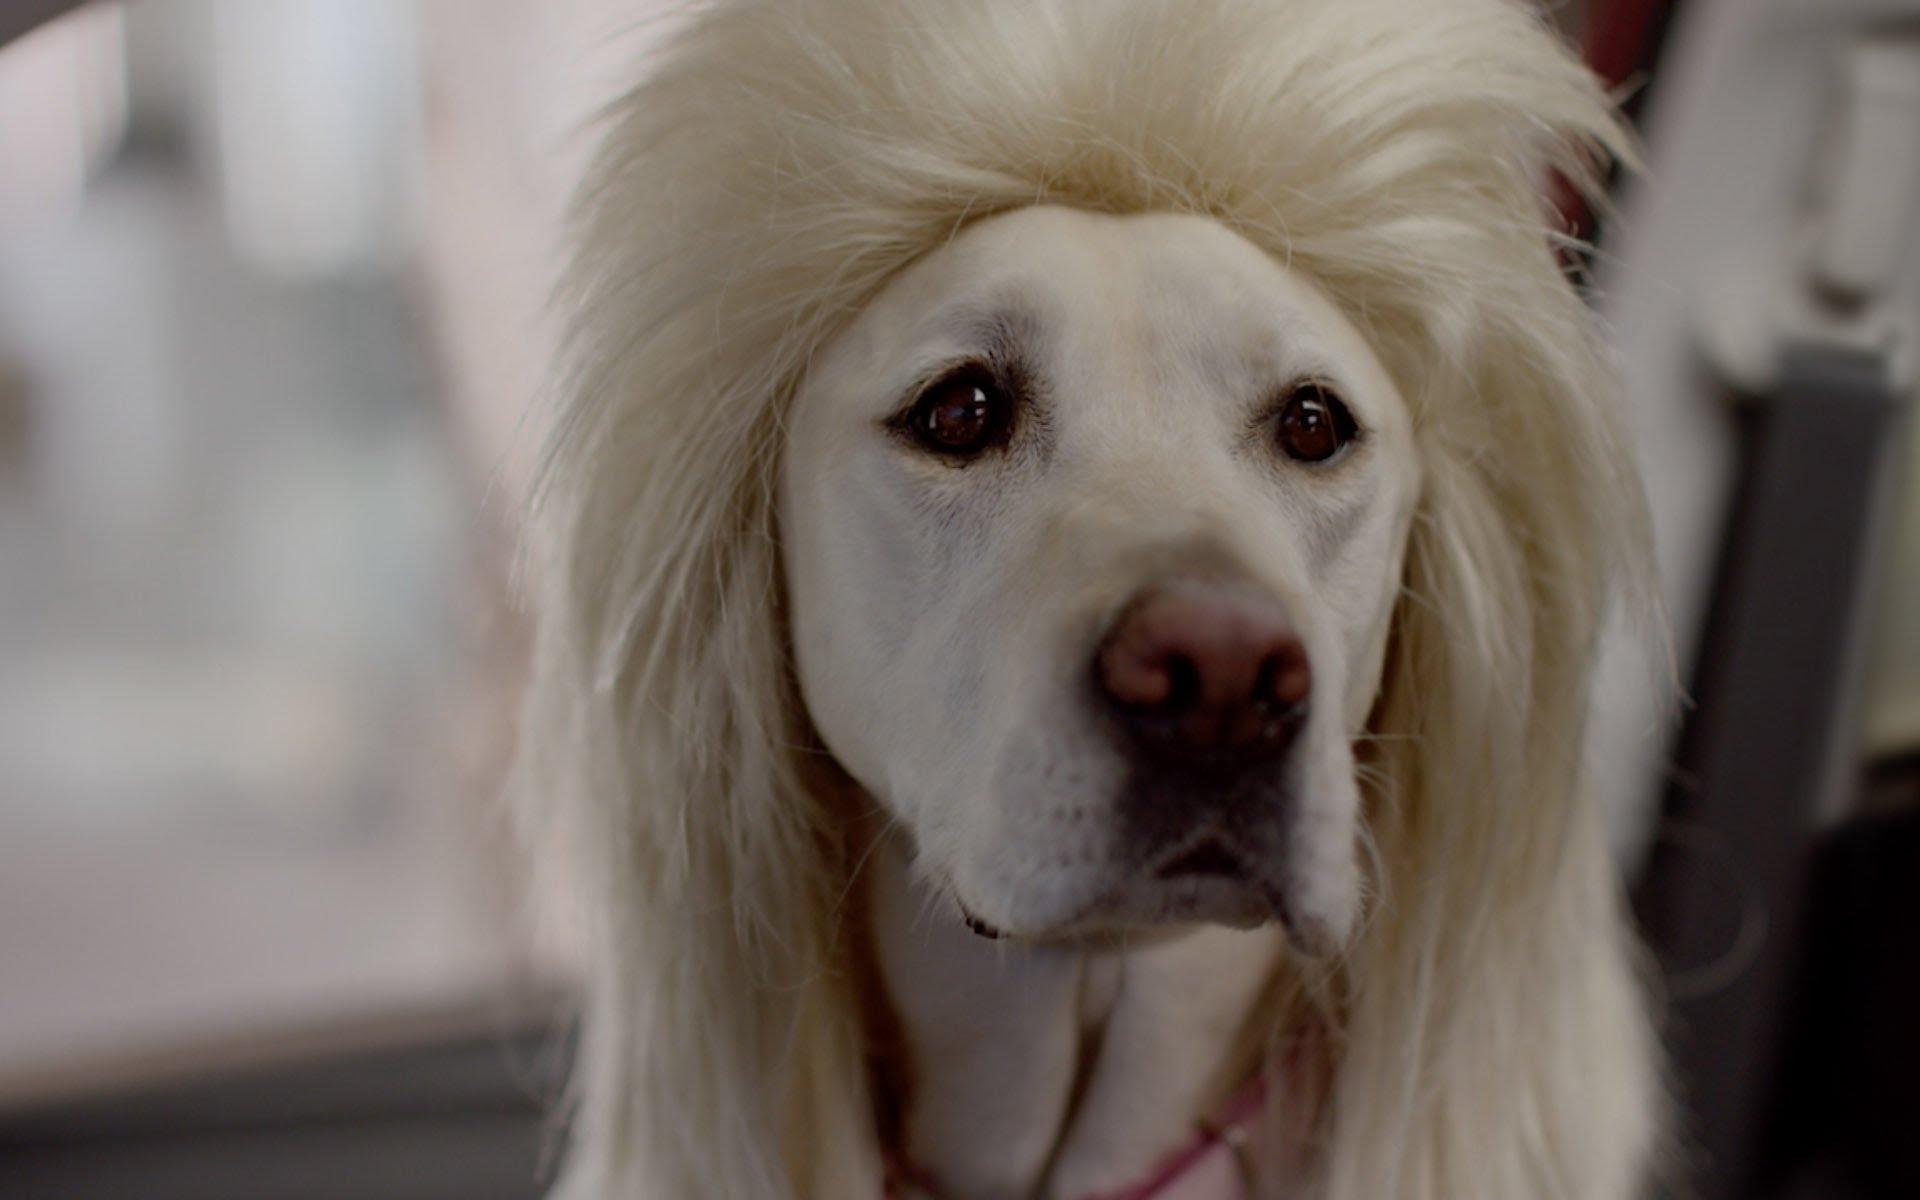 Subaru commercial Mrs. Barkley has a bad hair day